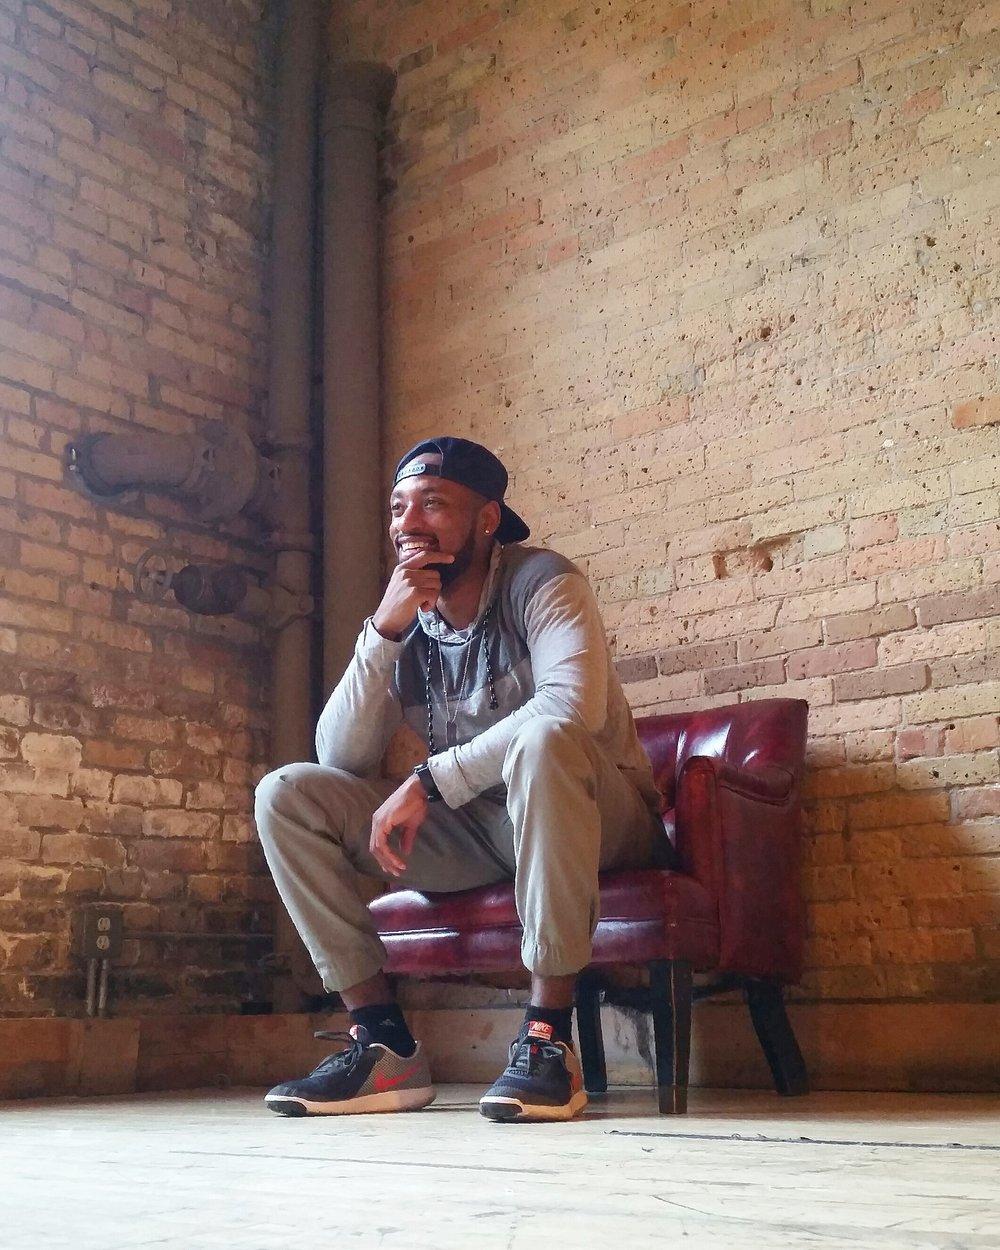 Robert Hayes - Hip Hop Artist@robbhayesmusic